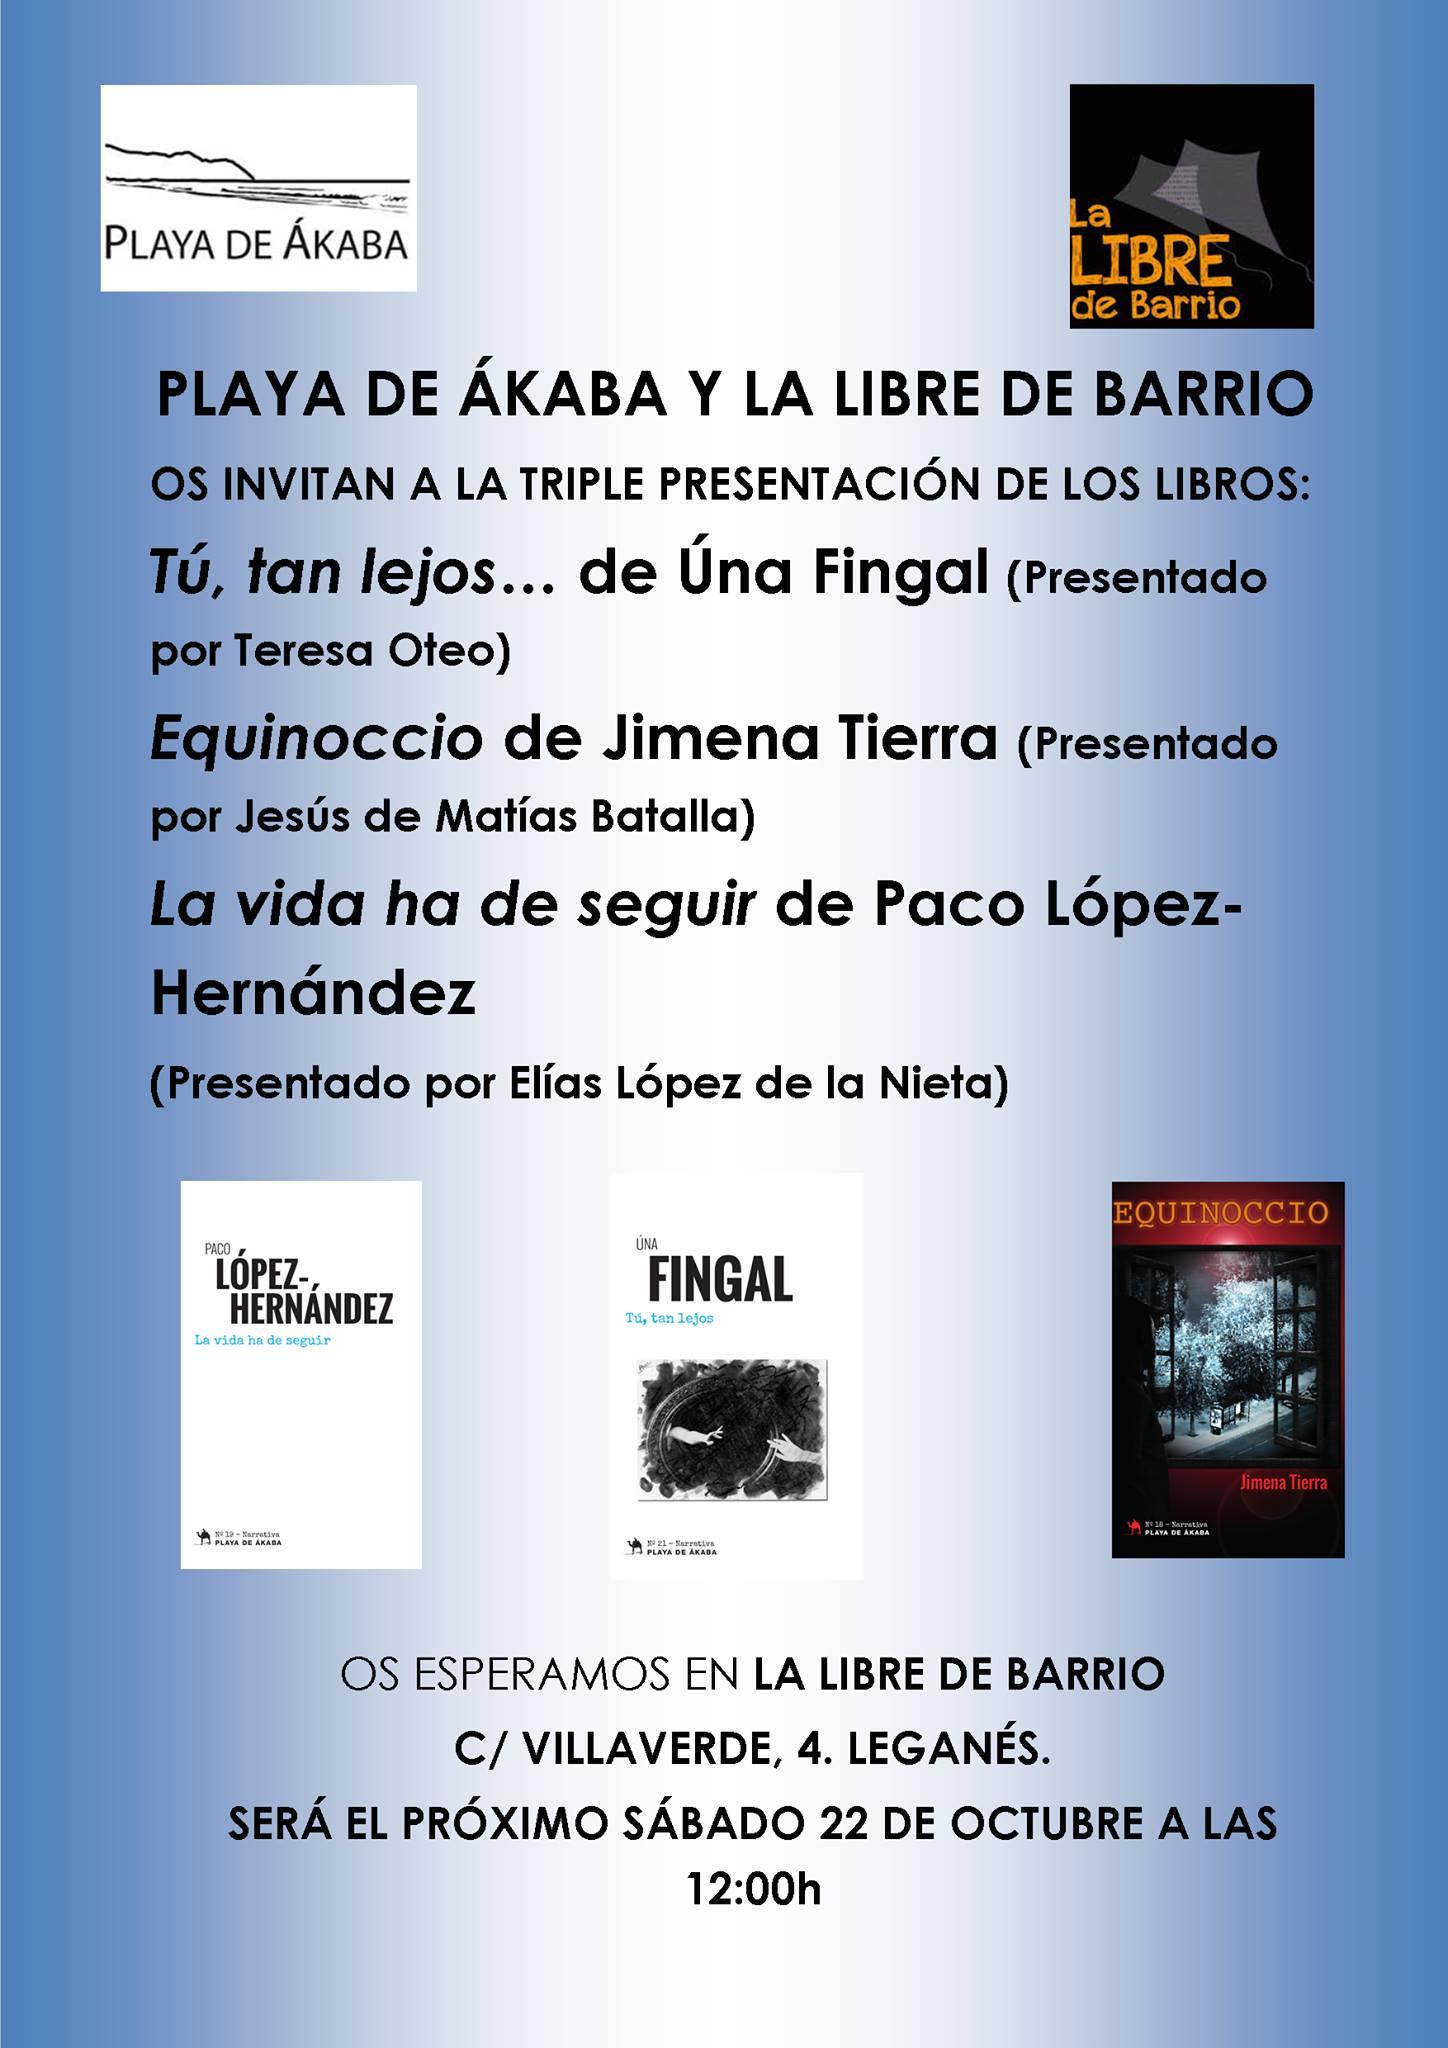 Tarjetón_Libre_de_Barrio